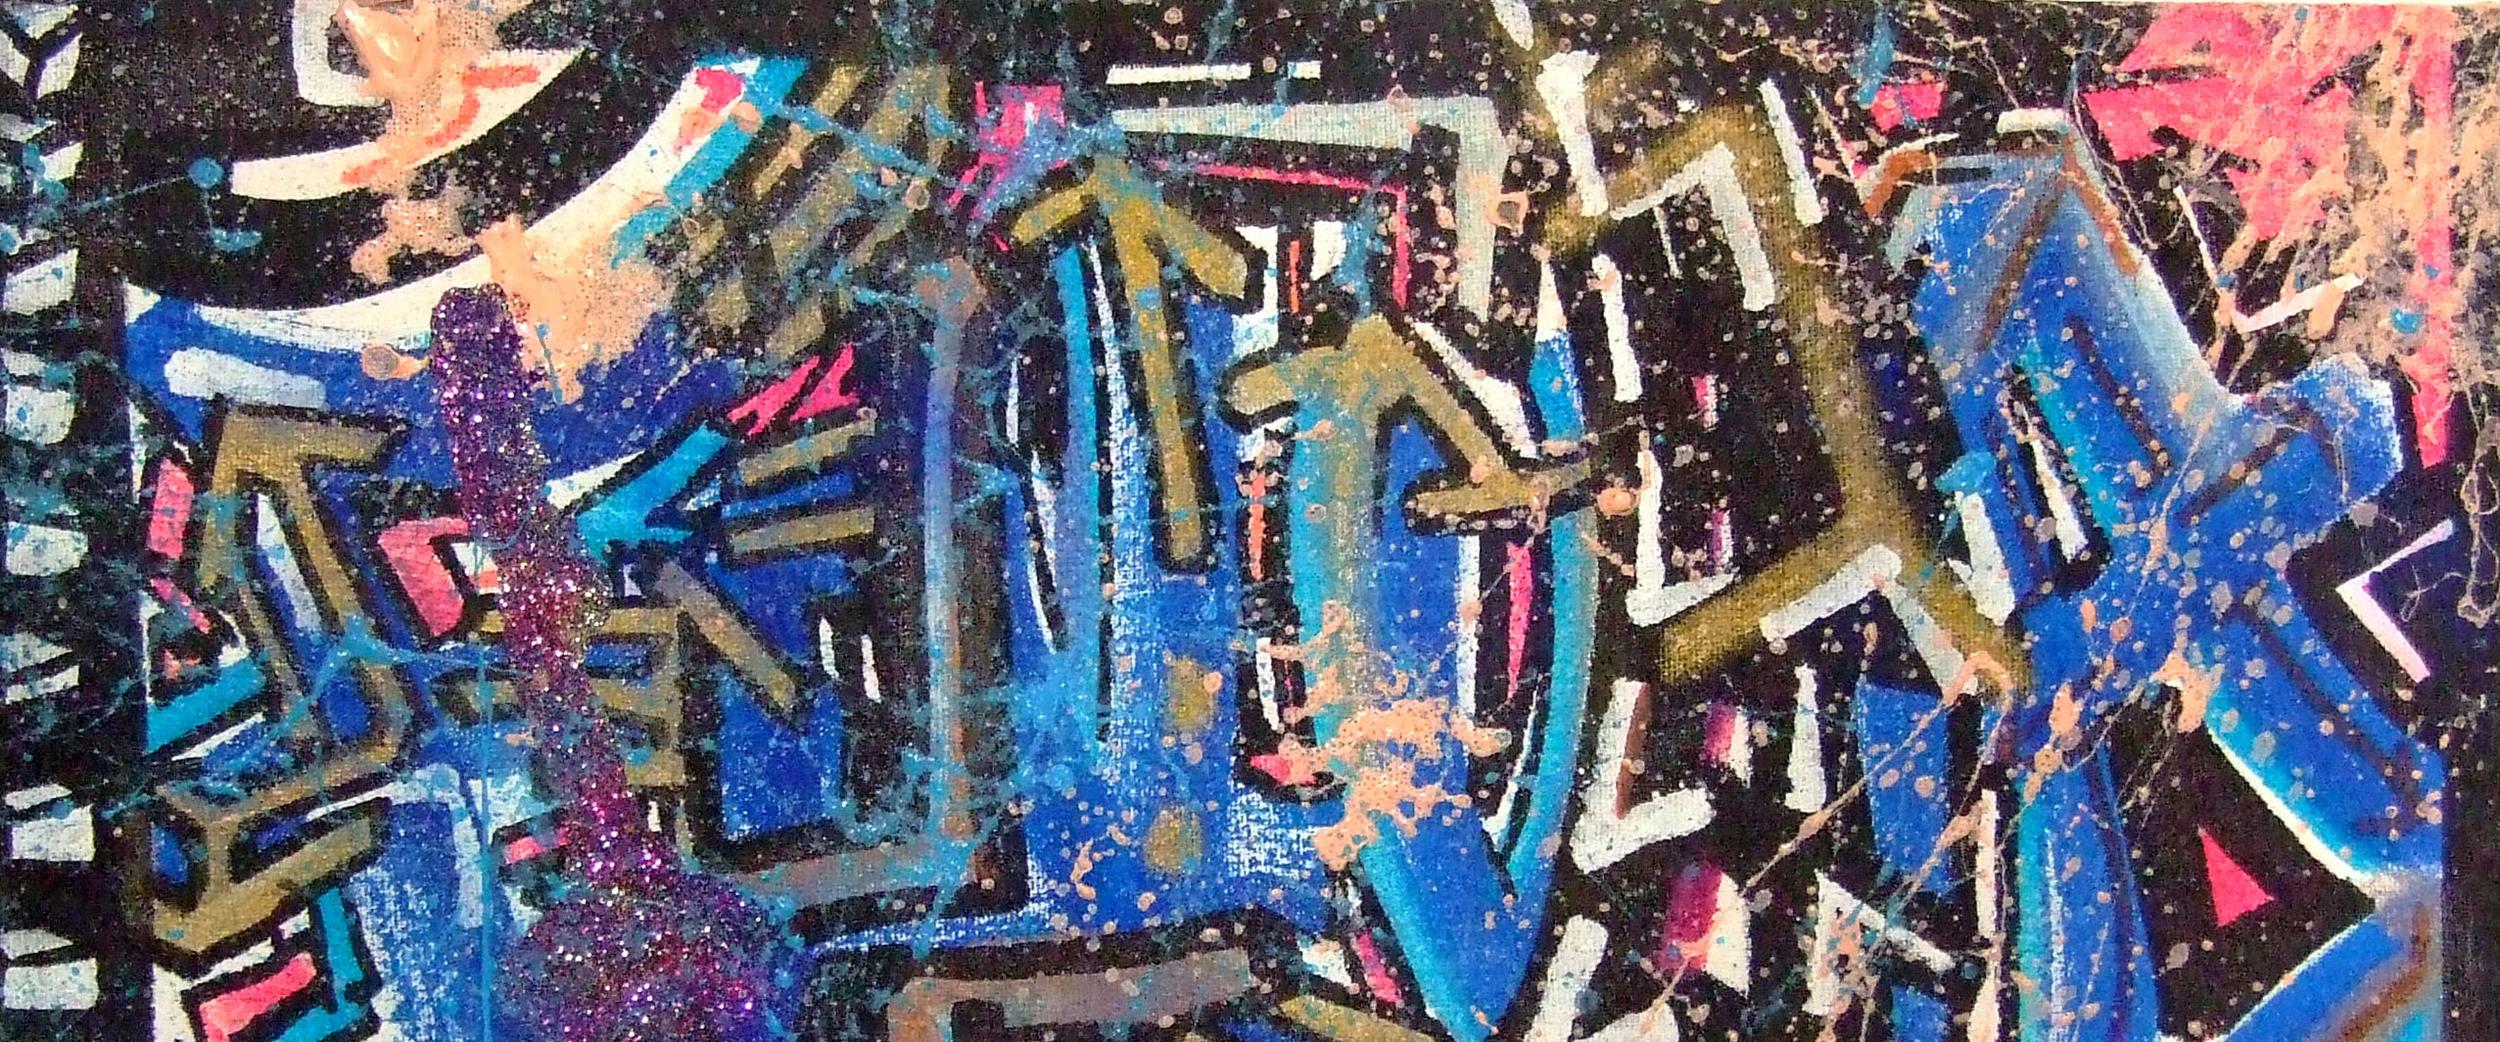 painting (7b).jpg